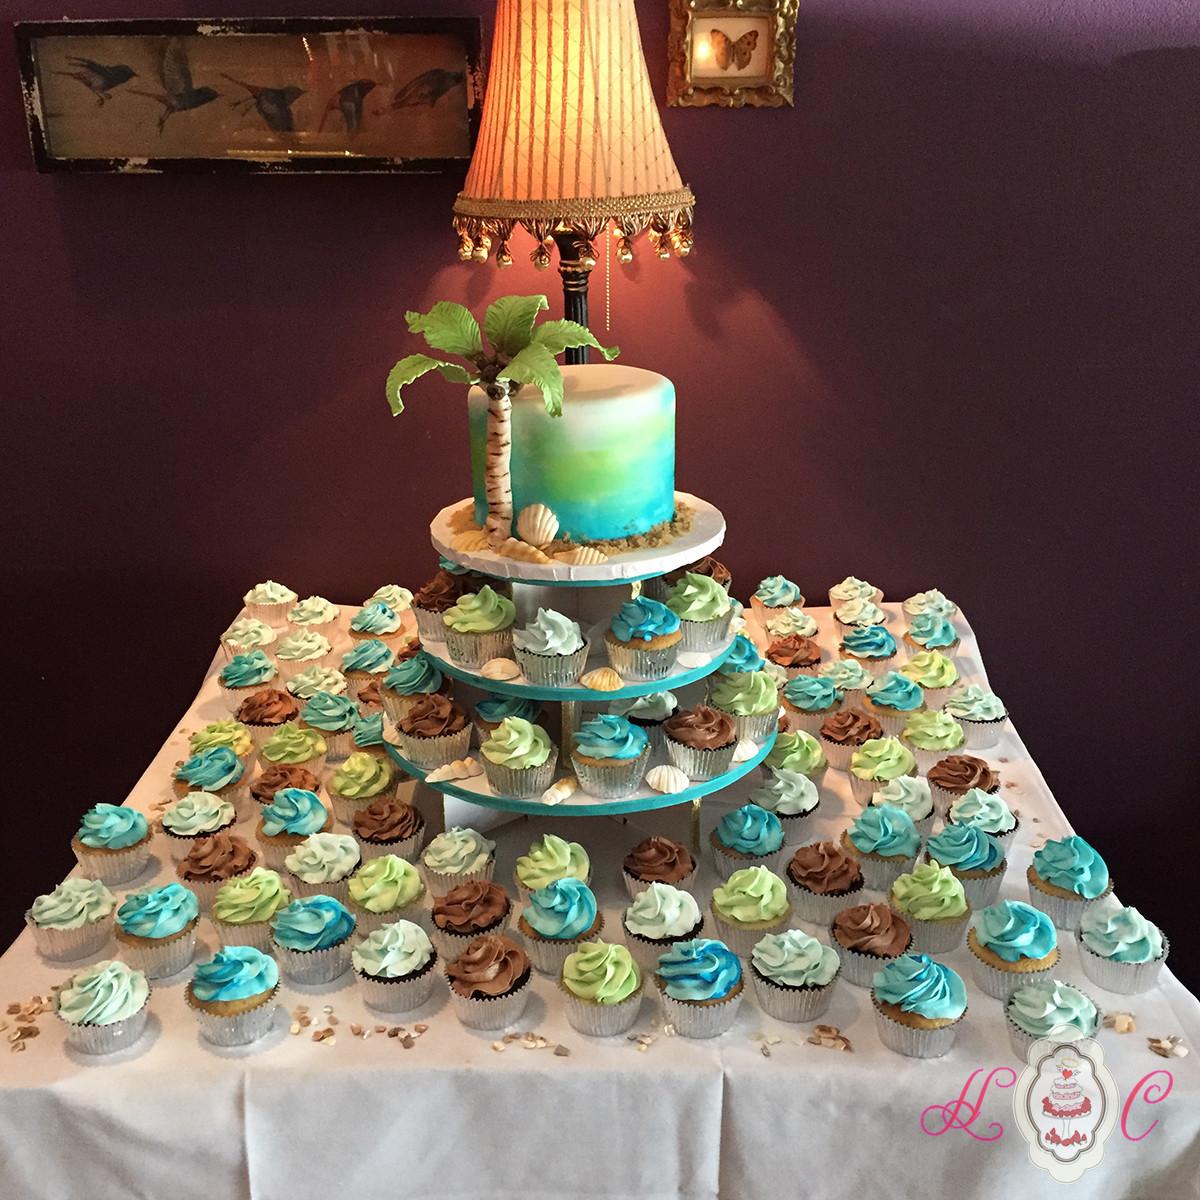 Wedding Cupcake Cakes  Wedding Cakes in Marietta Parkersburg & More Heavenly